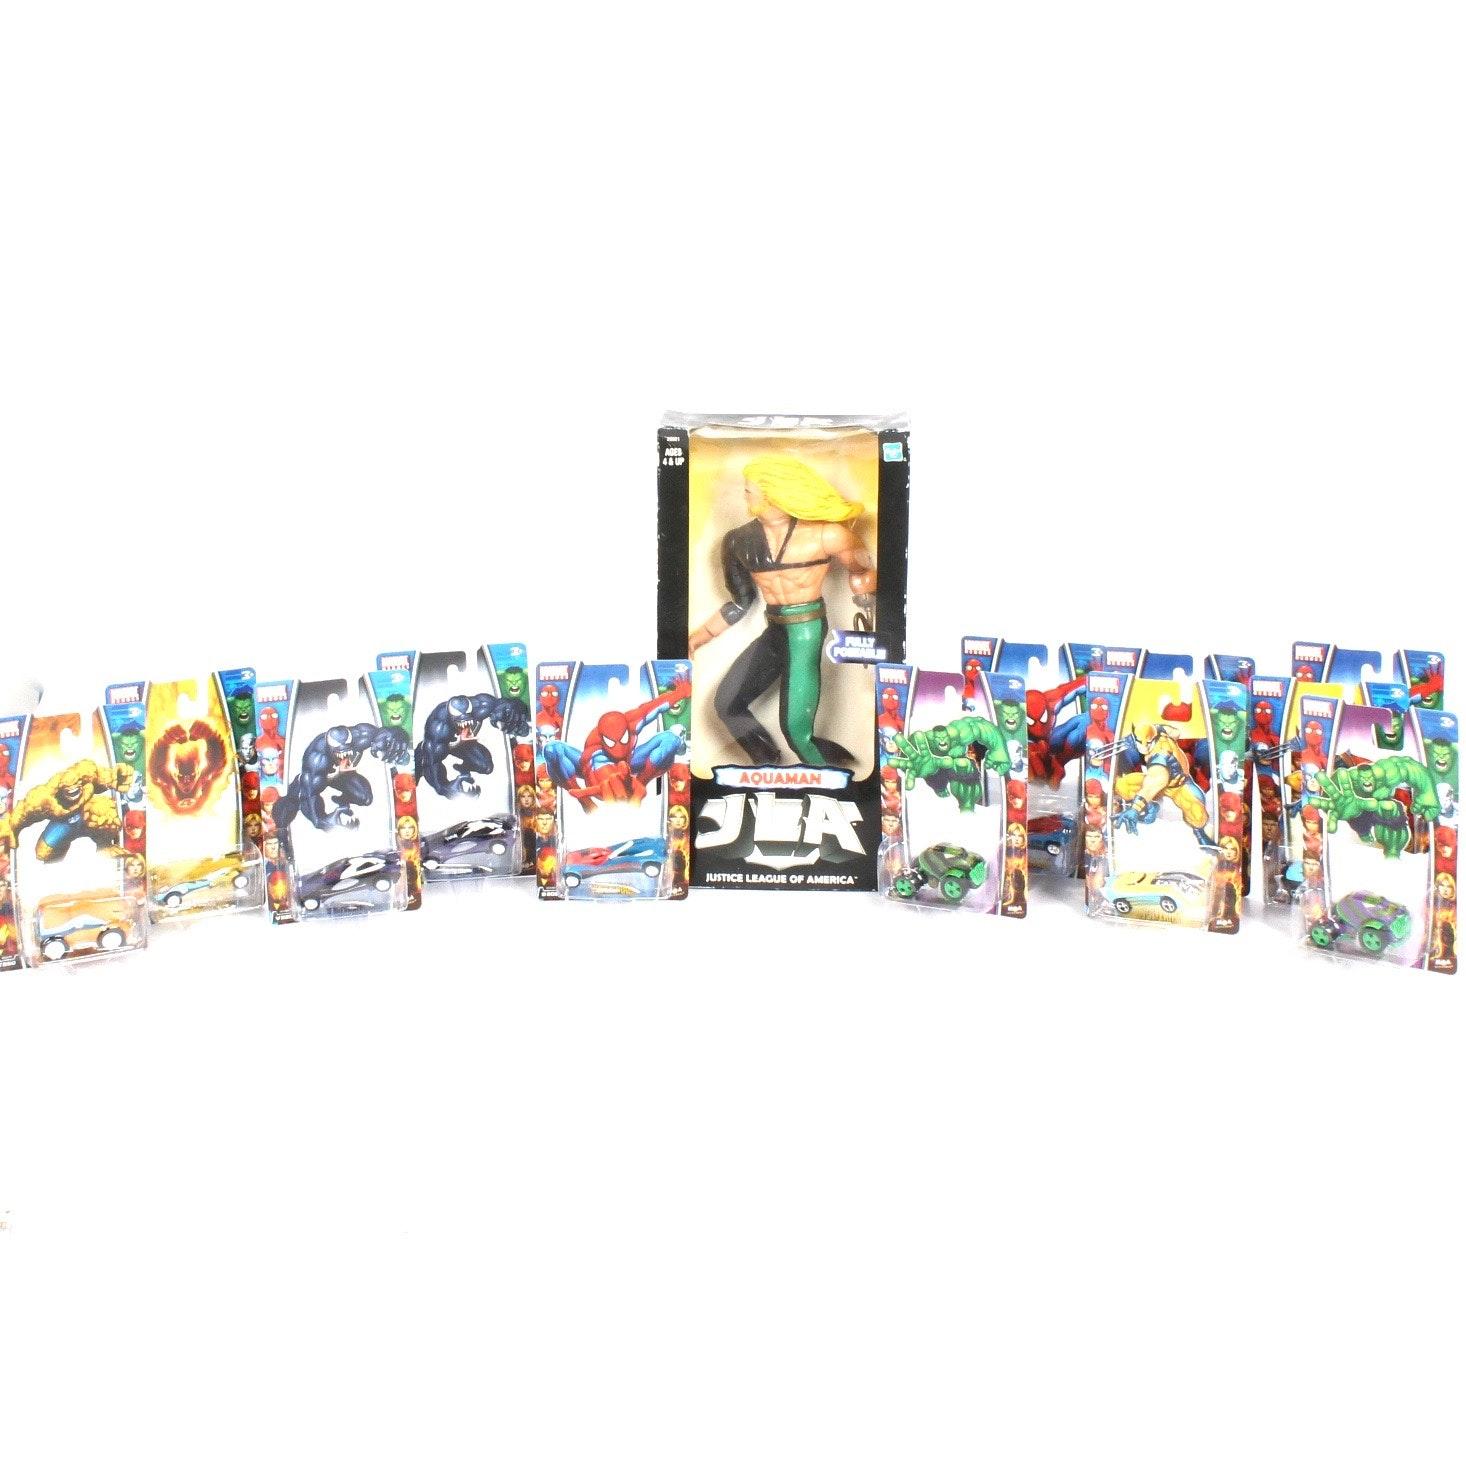 Marvel Heroes and Hasbro Aquaman Collectibles